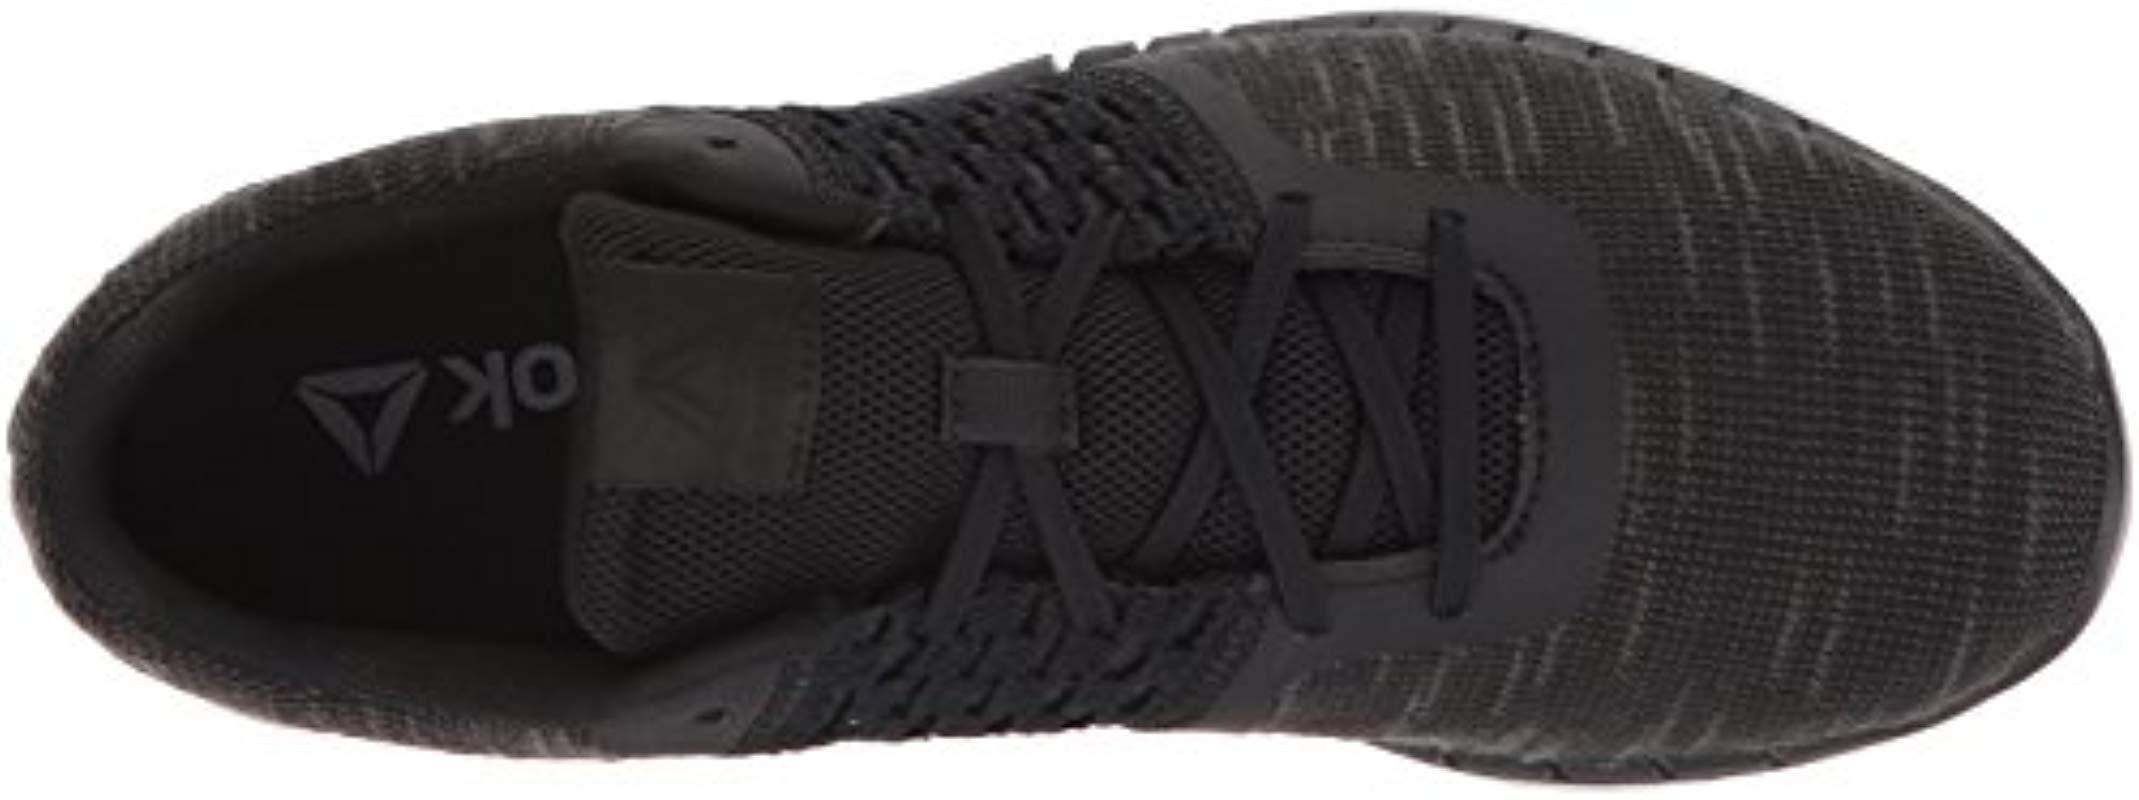 fe87b93ed31 Reebok - Black Print Run Dist Sneaker - Lyst. View fullscreen